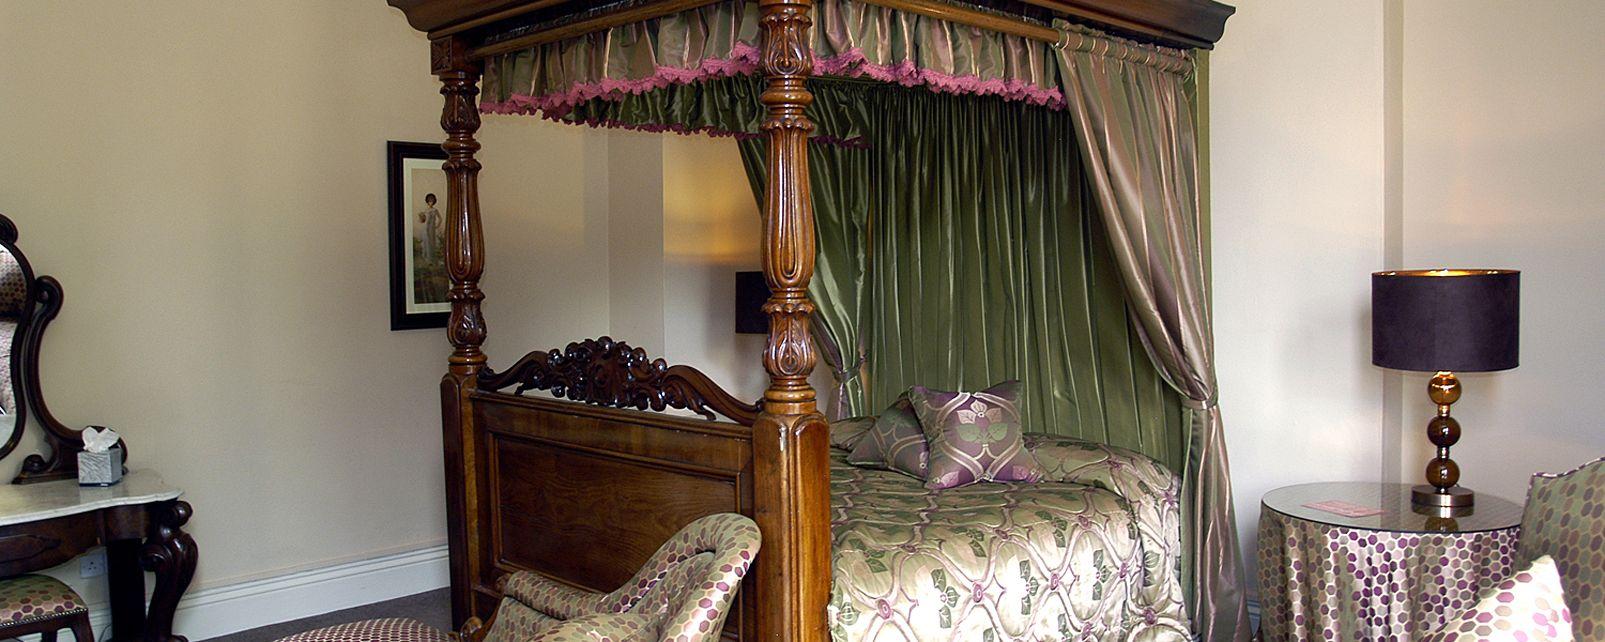 Hotel Ariel House